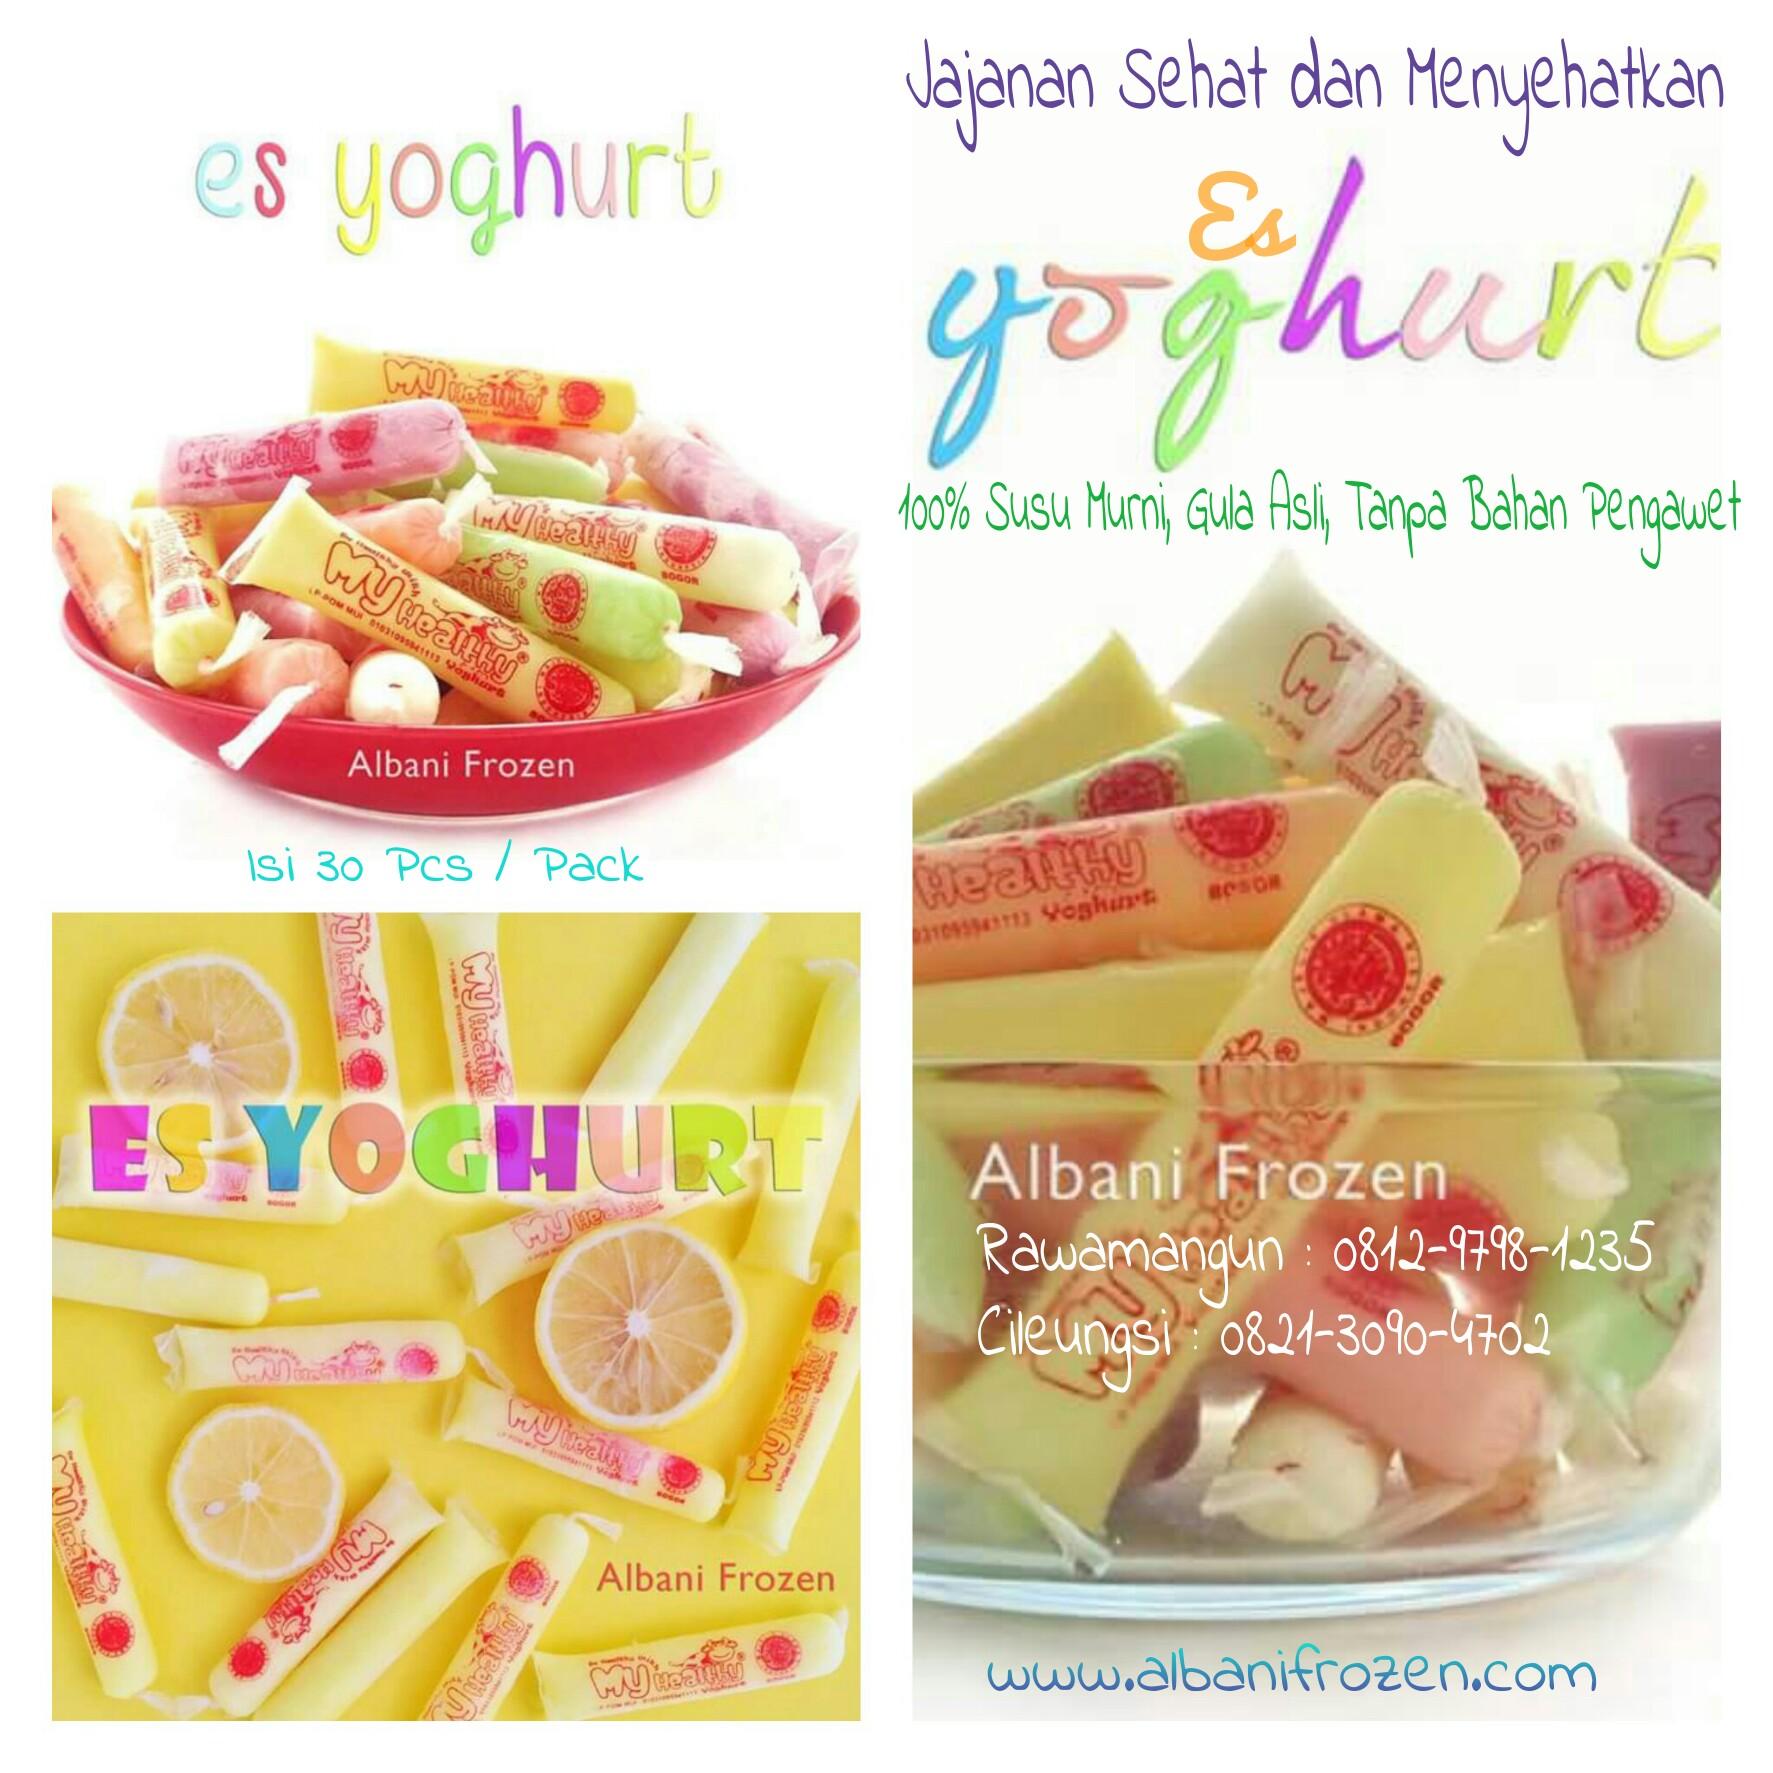 es yoghurt my healthy - Jual Roti Maryam - Harga Roti ...